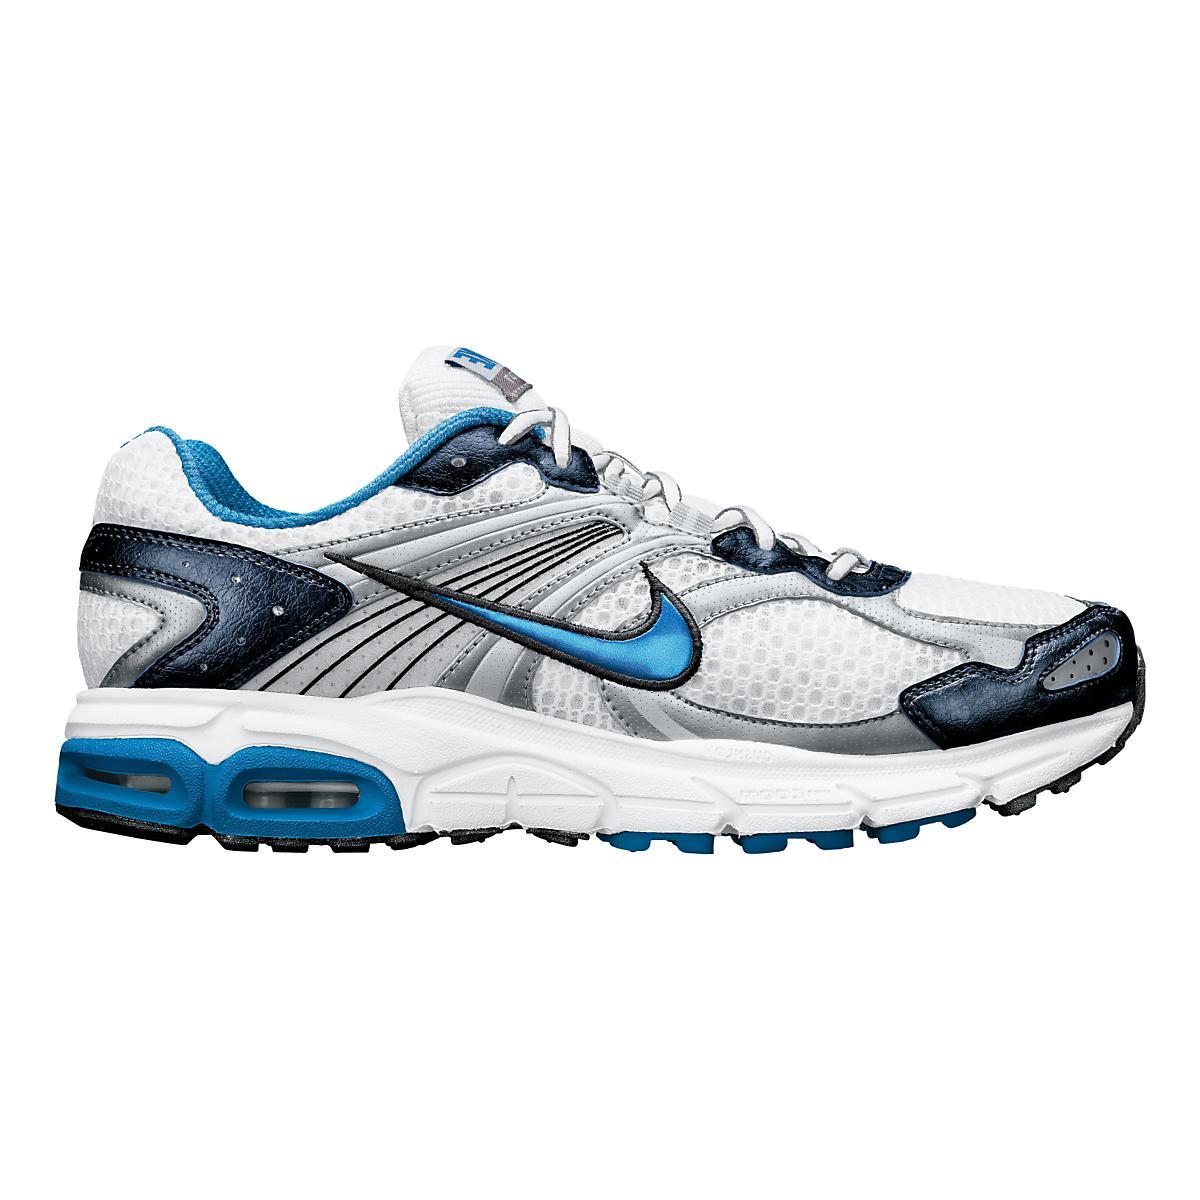 ... Mens Nike Air Max Moto 7 Running Shoe At Road Runner Sports ... 551bb6e4d291